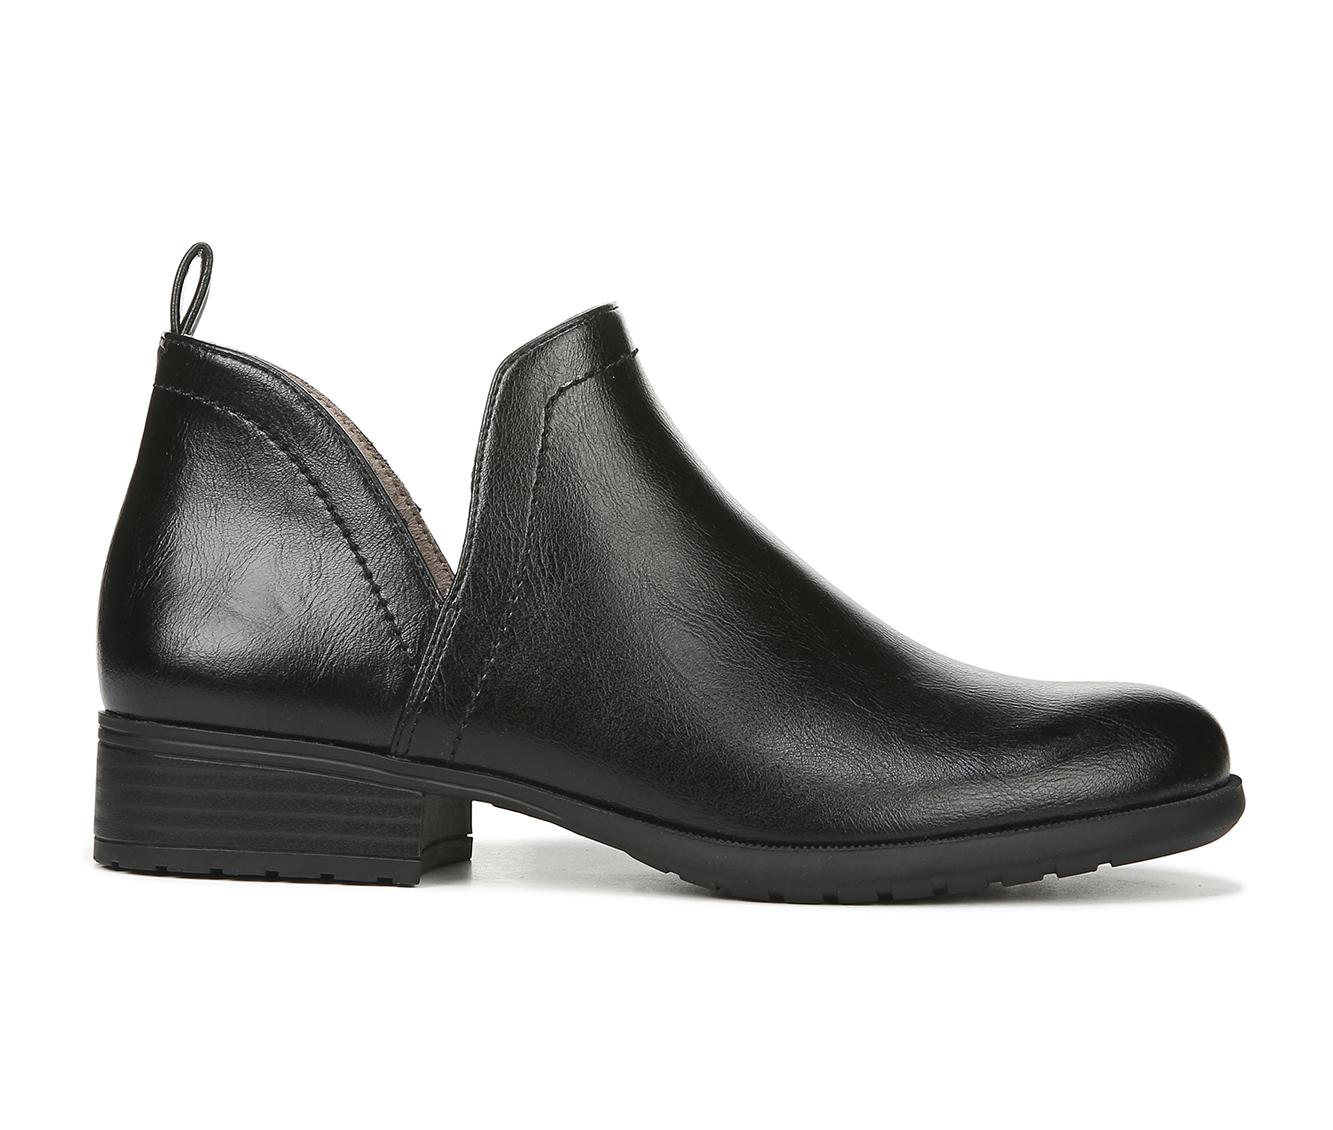 LifeStride Xaria Women's Boots (Black - Faux Leather)